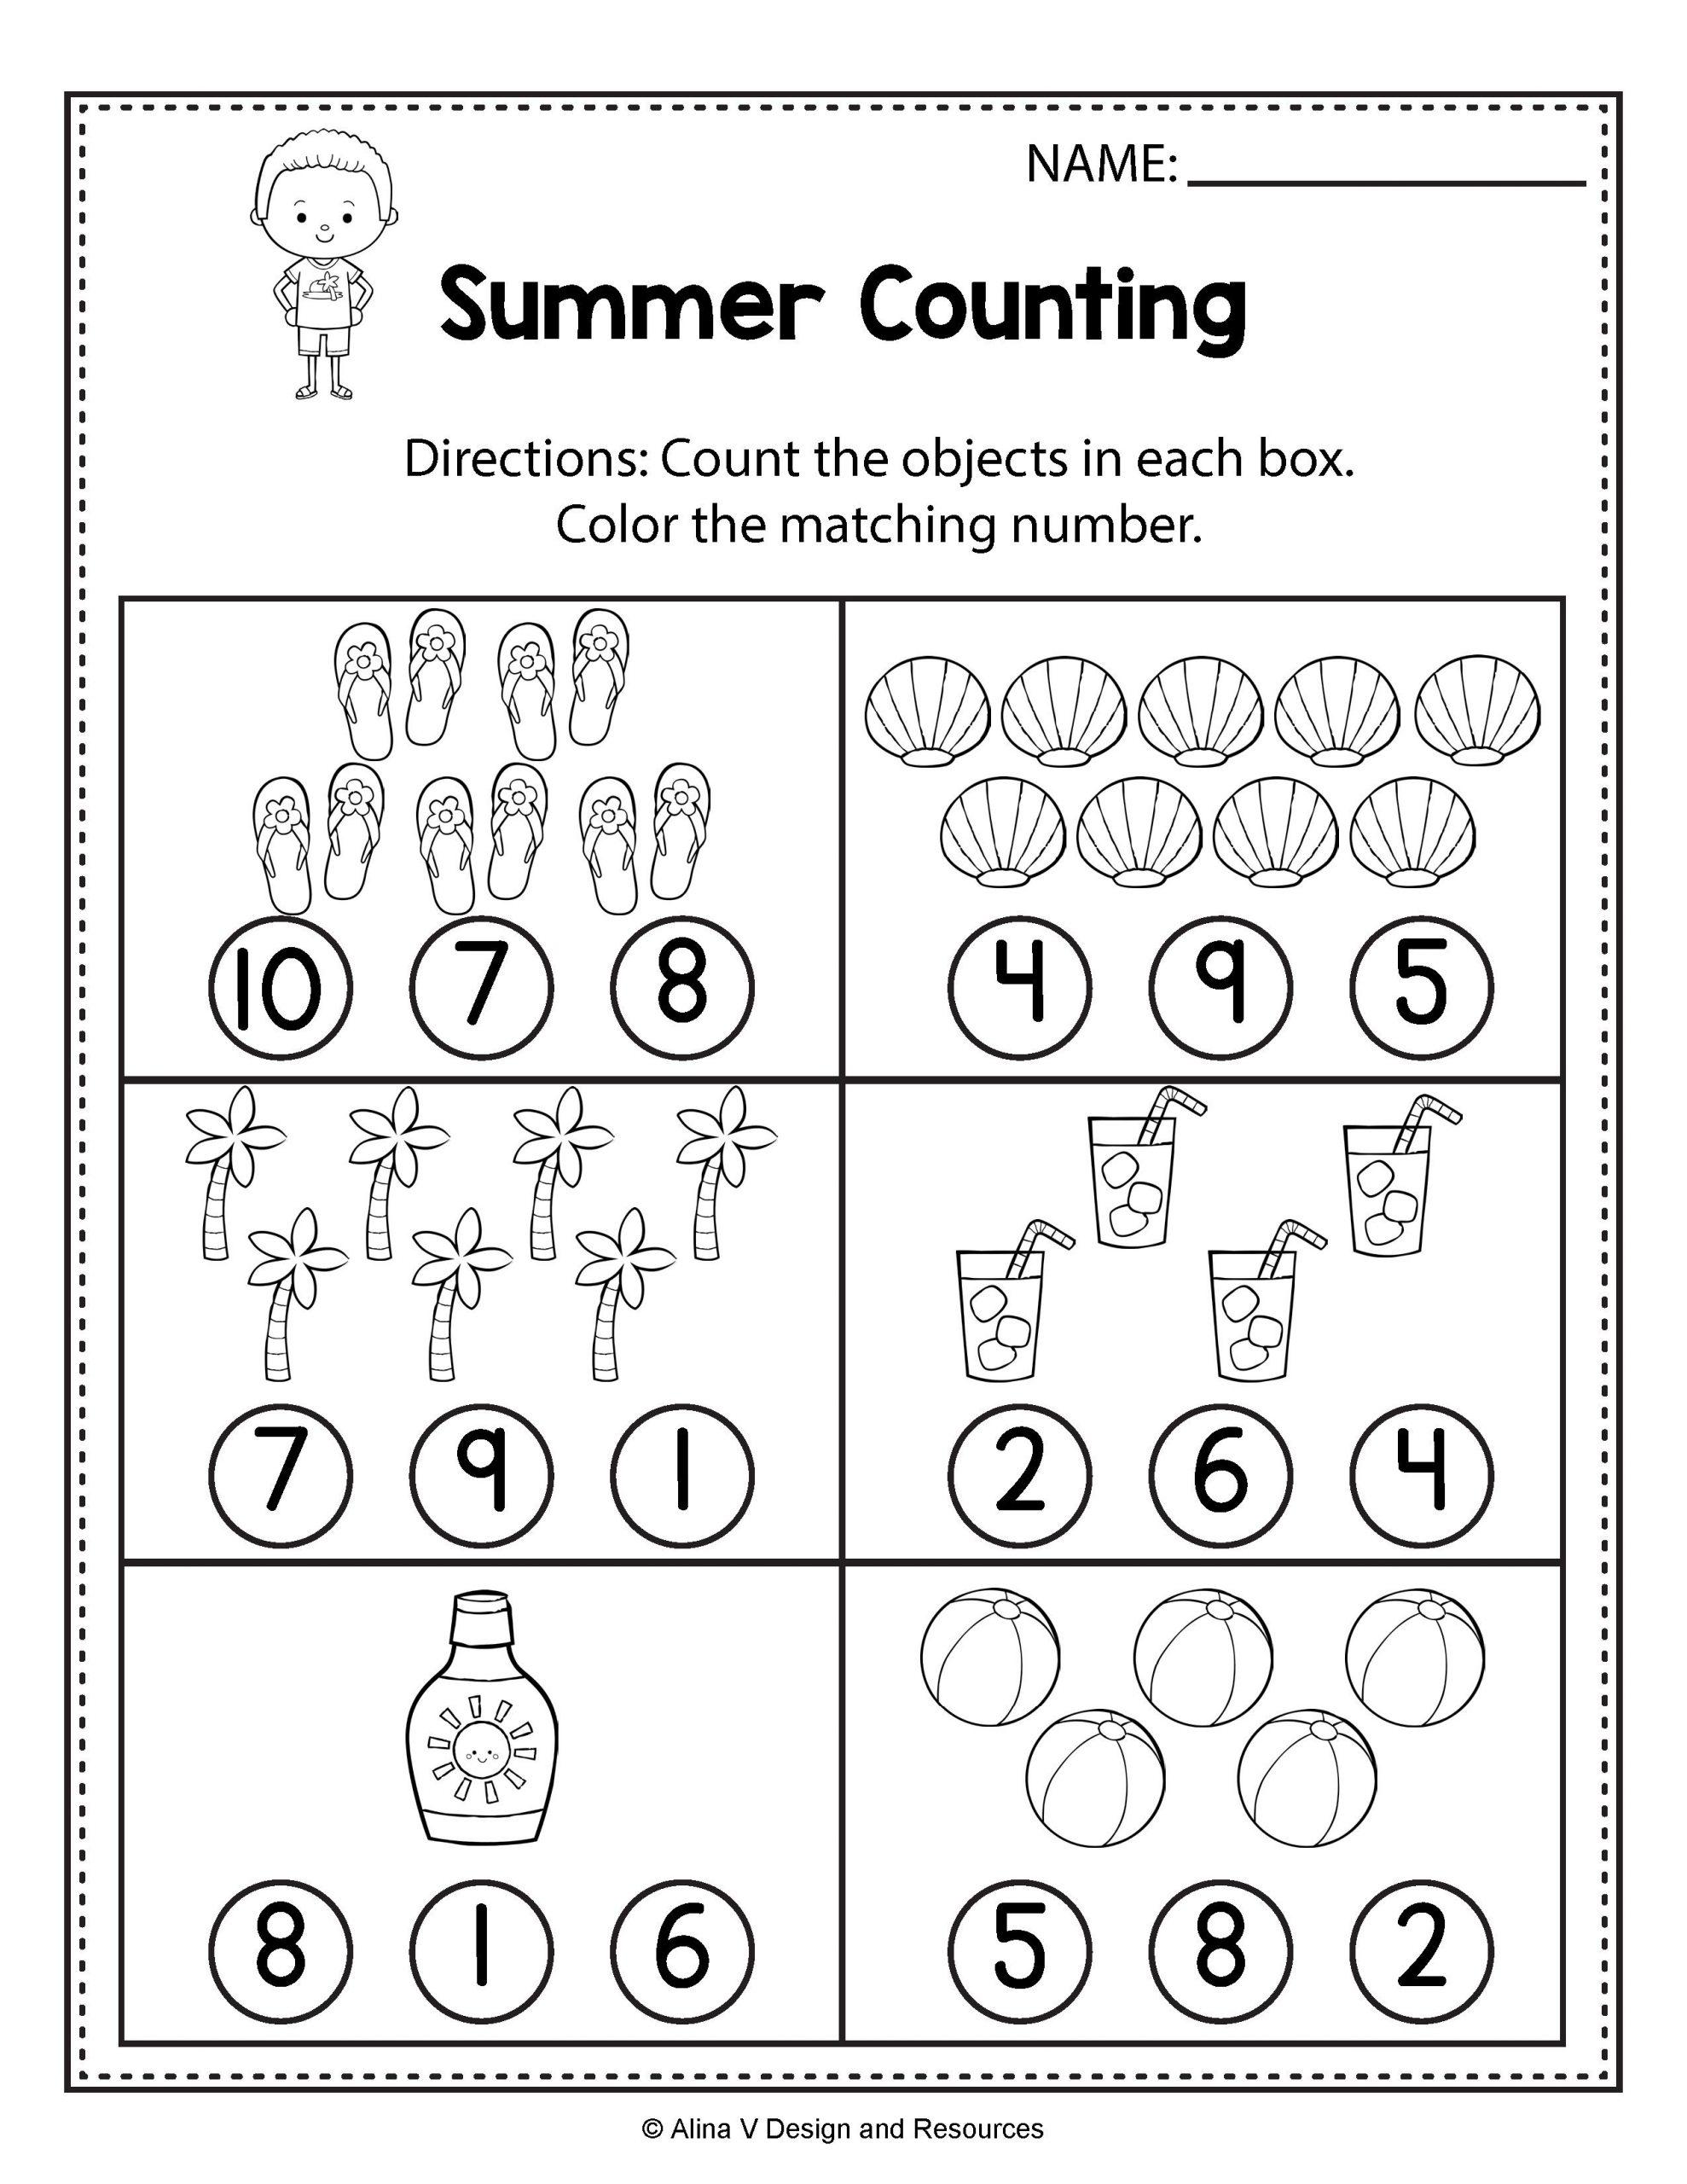 Math Worksheet : Mathksheet Ideas Countingksheets For